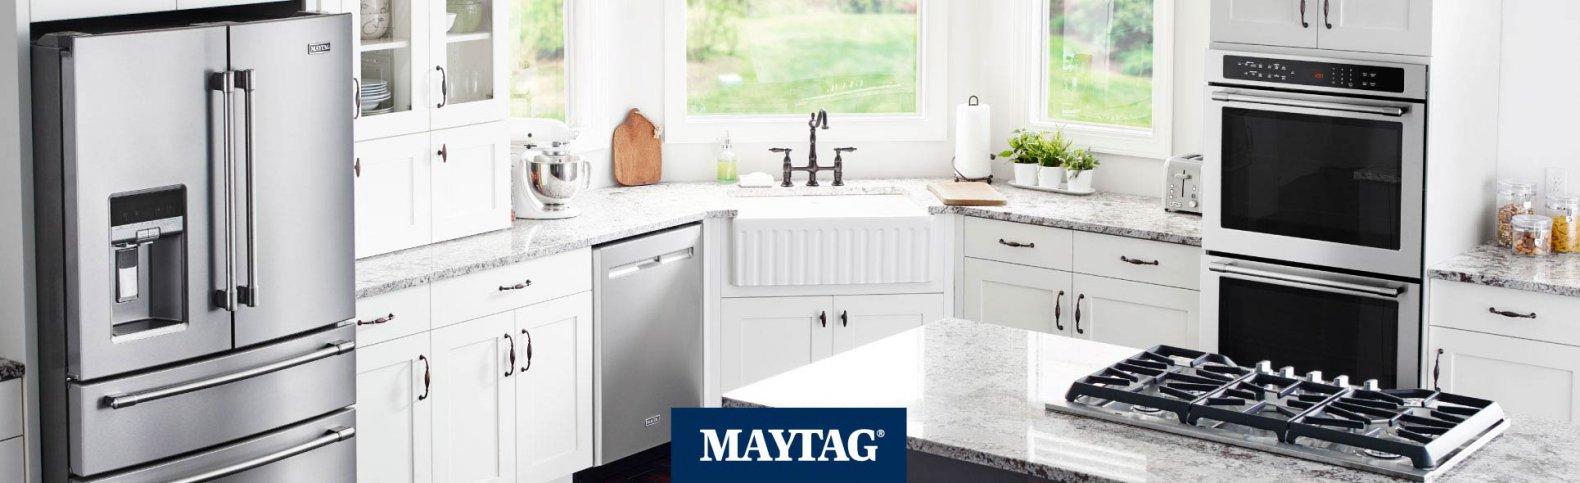 maytag kitchen appliances sheers